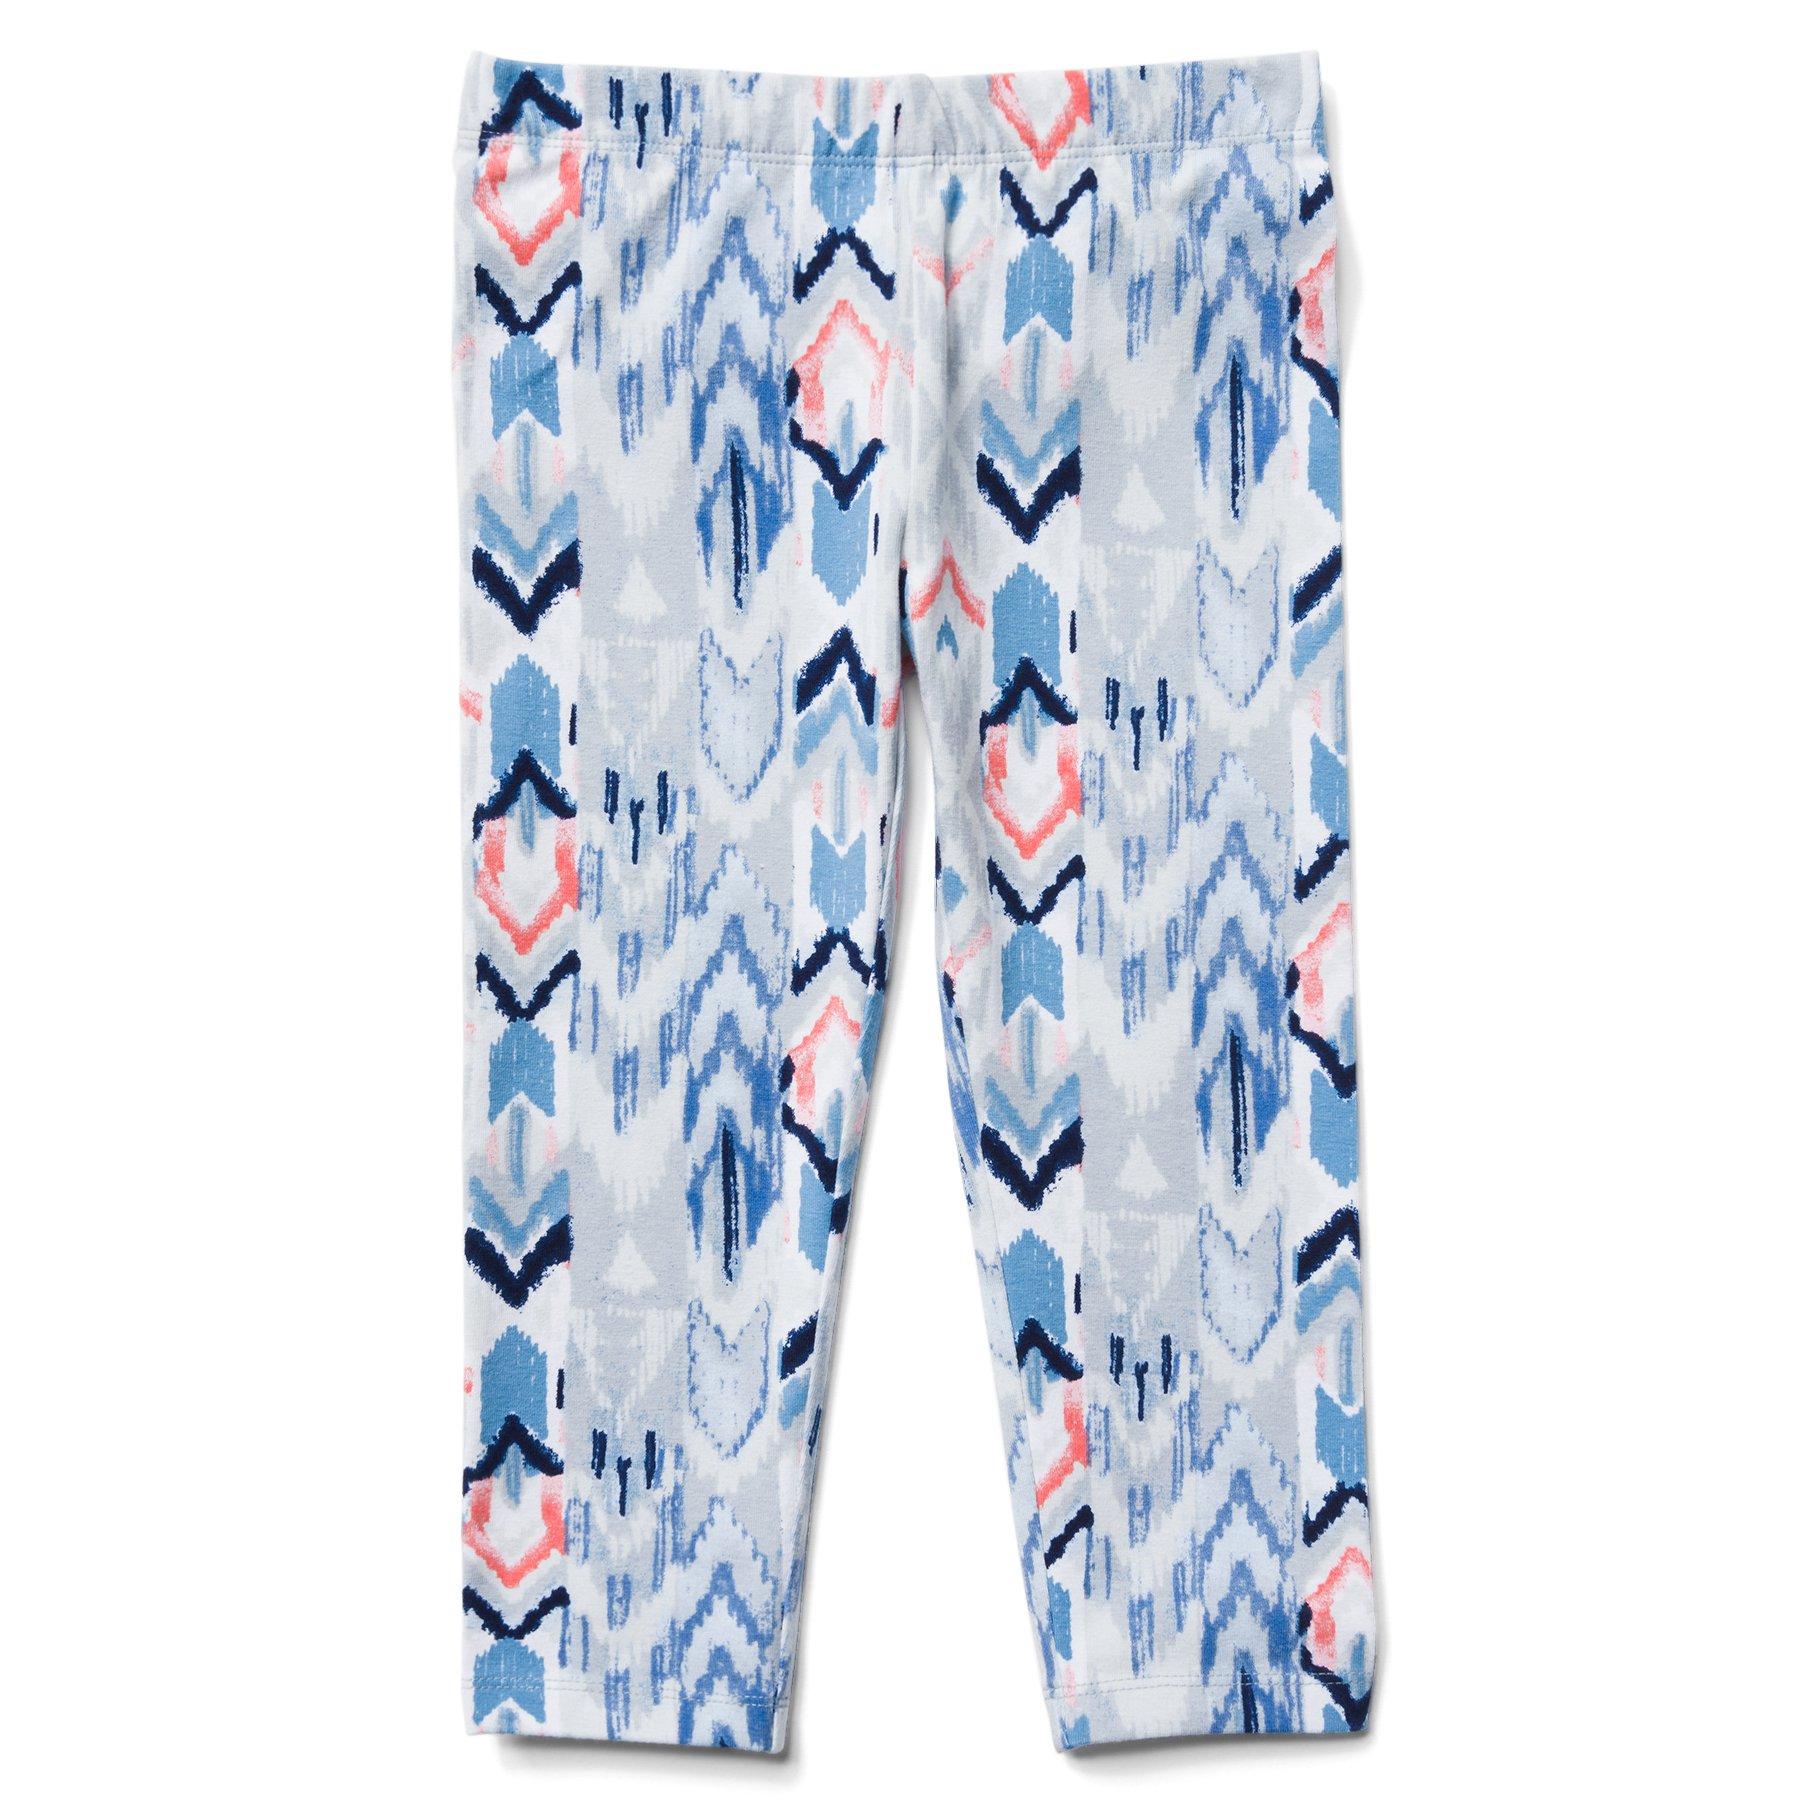 Gymboree Little Girls' Printed Capri Leggings, Tidal Blue Ikat, M